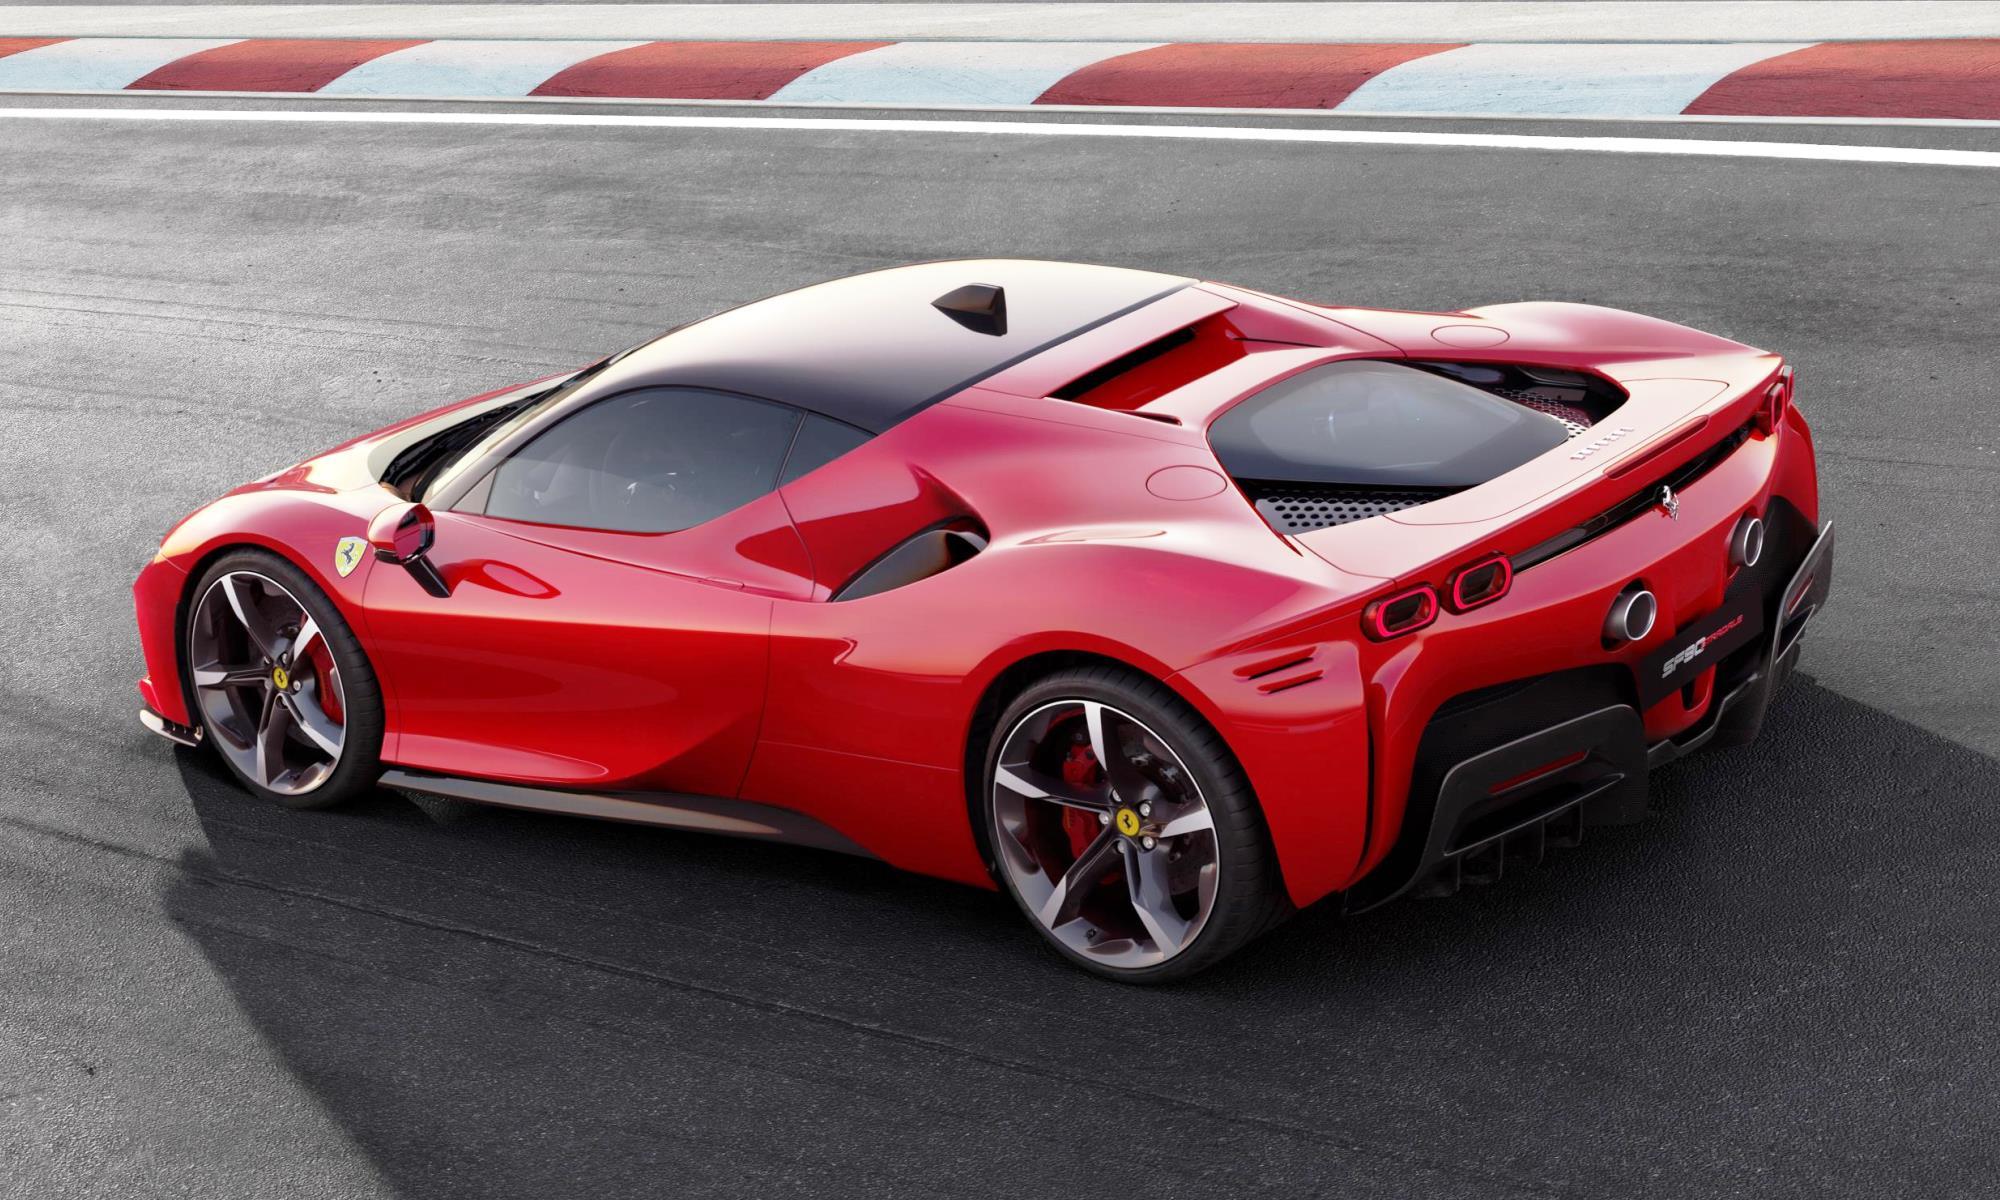 Ferrari SF90 Stradale side